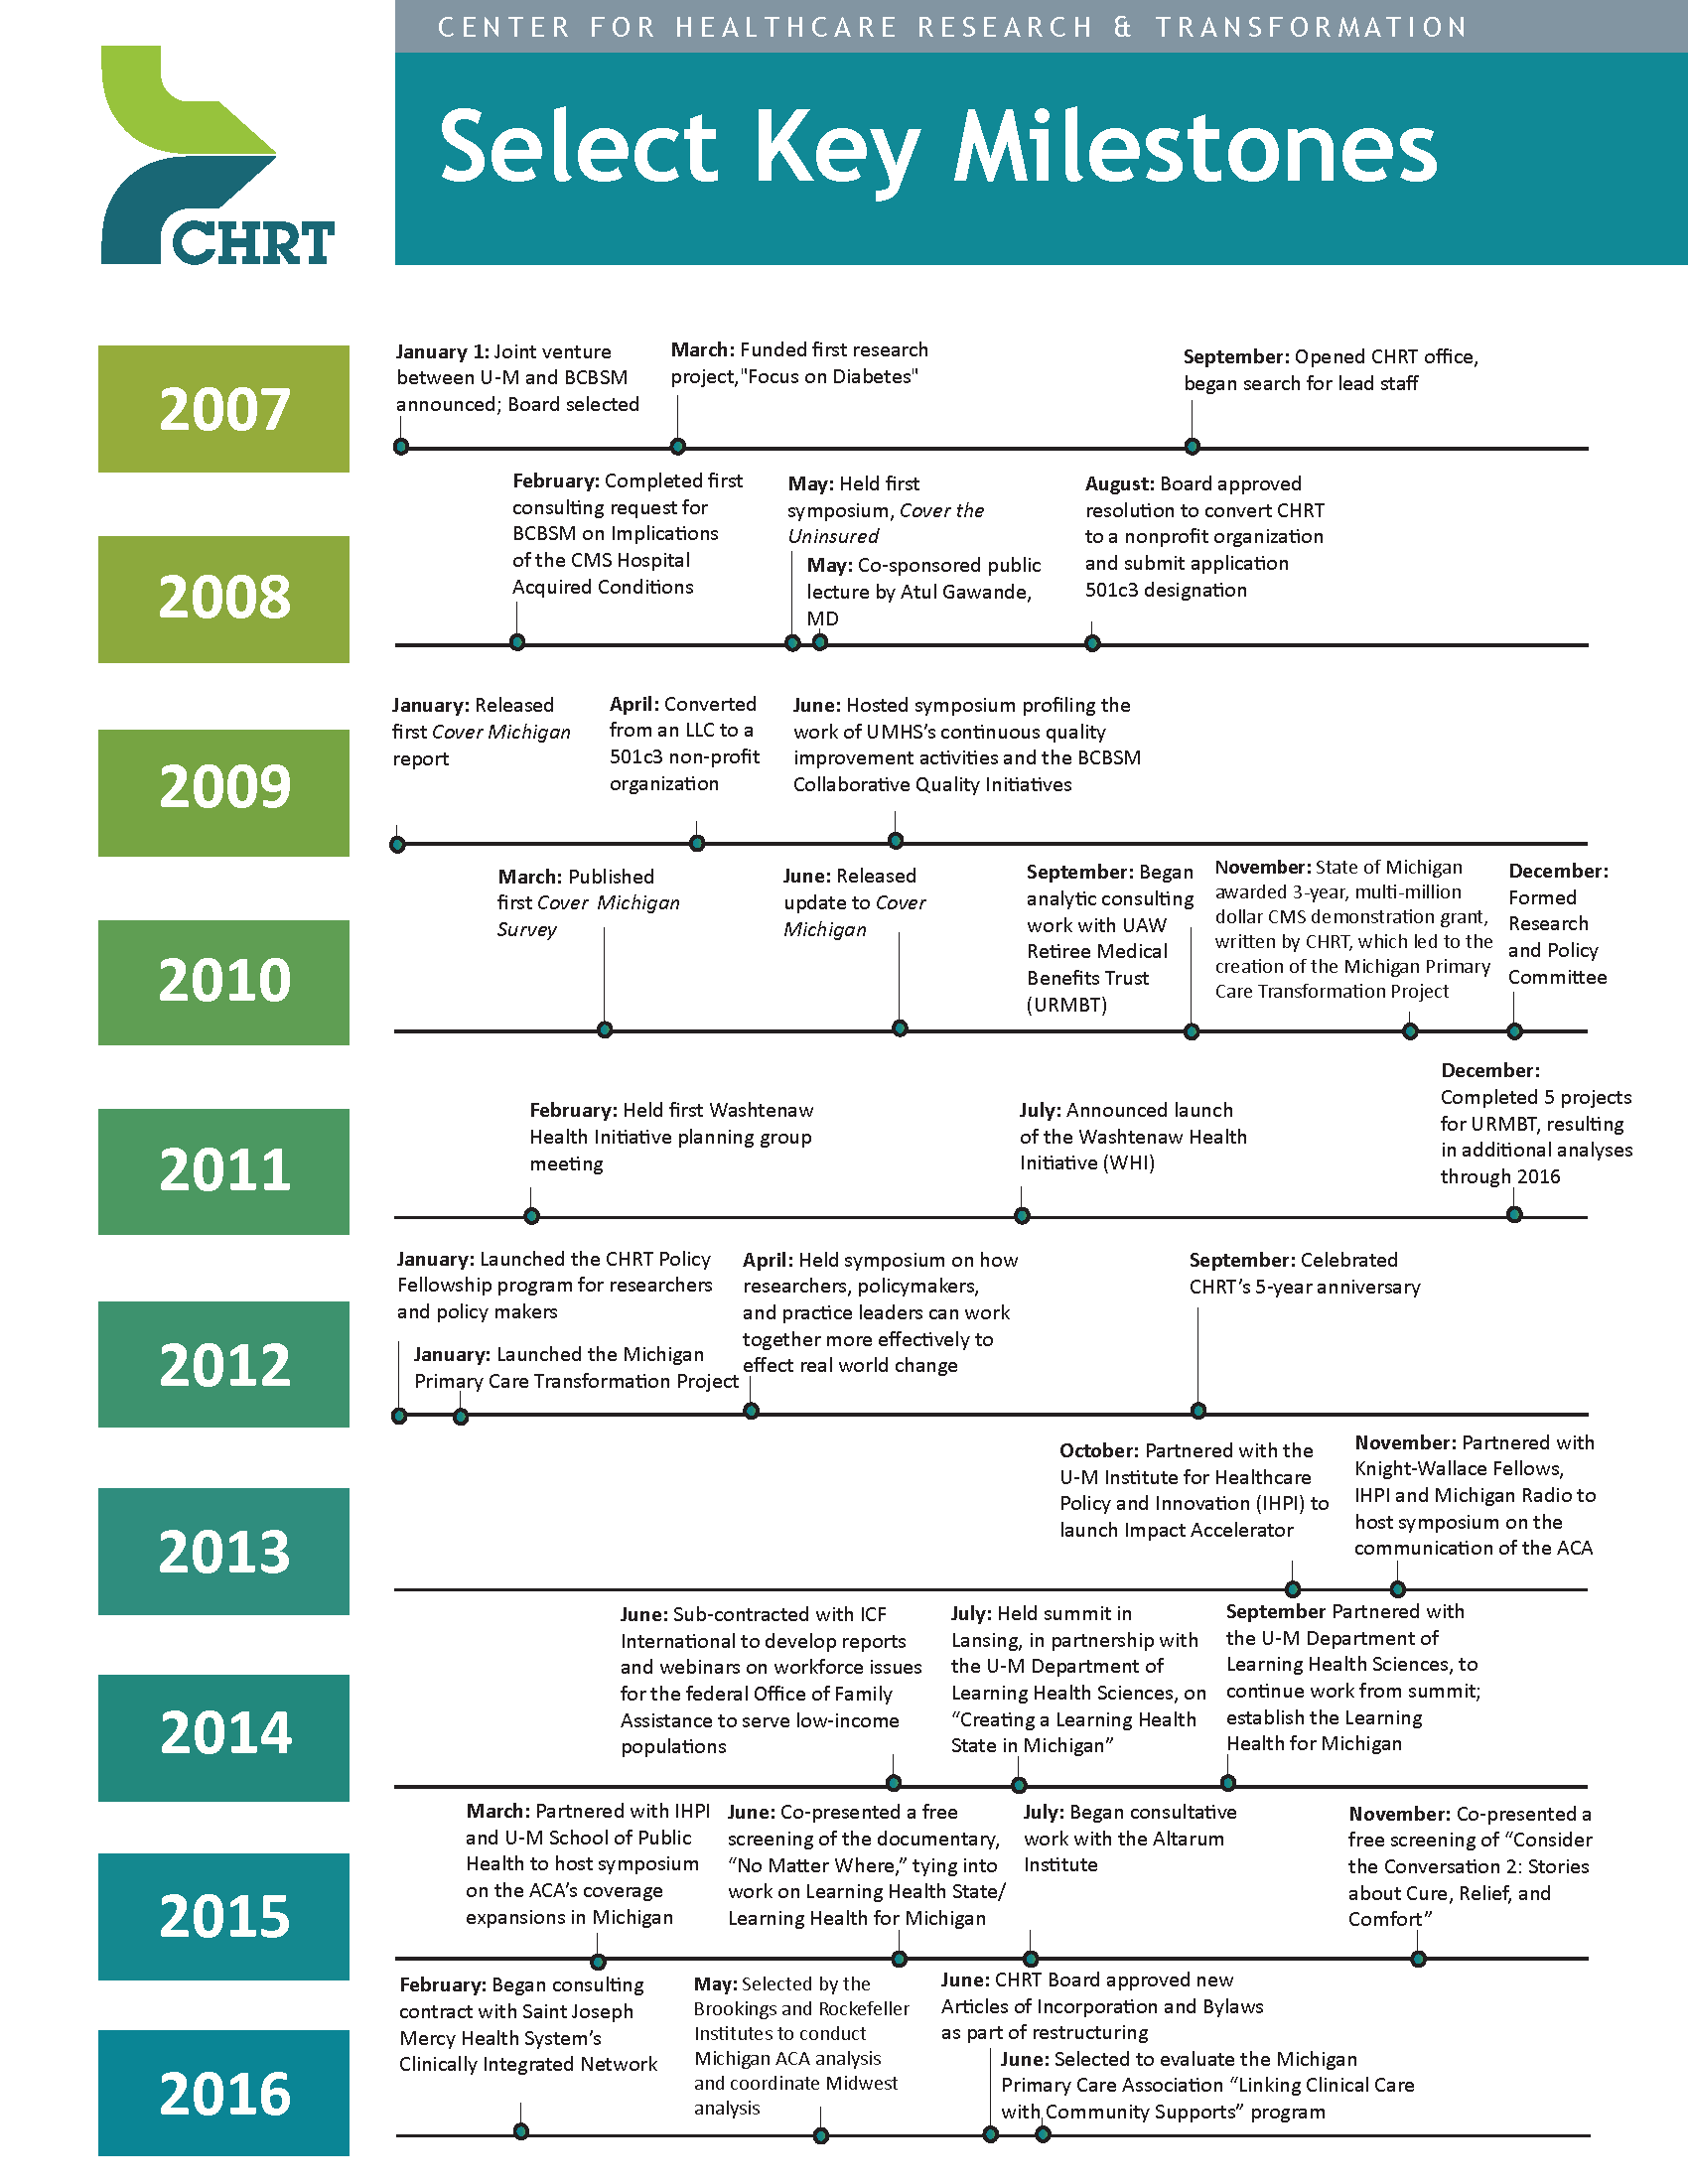 About_History_Key Milestones